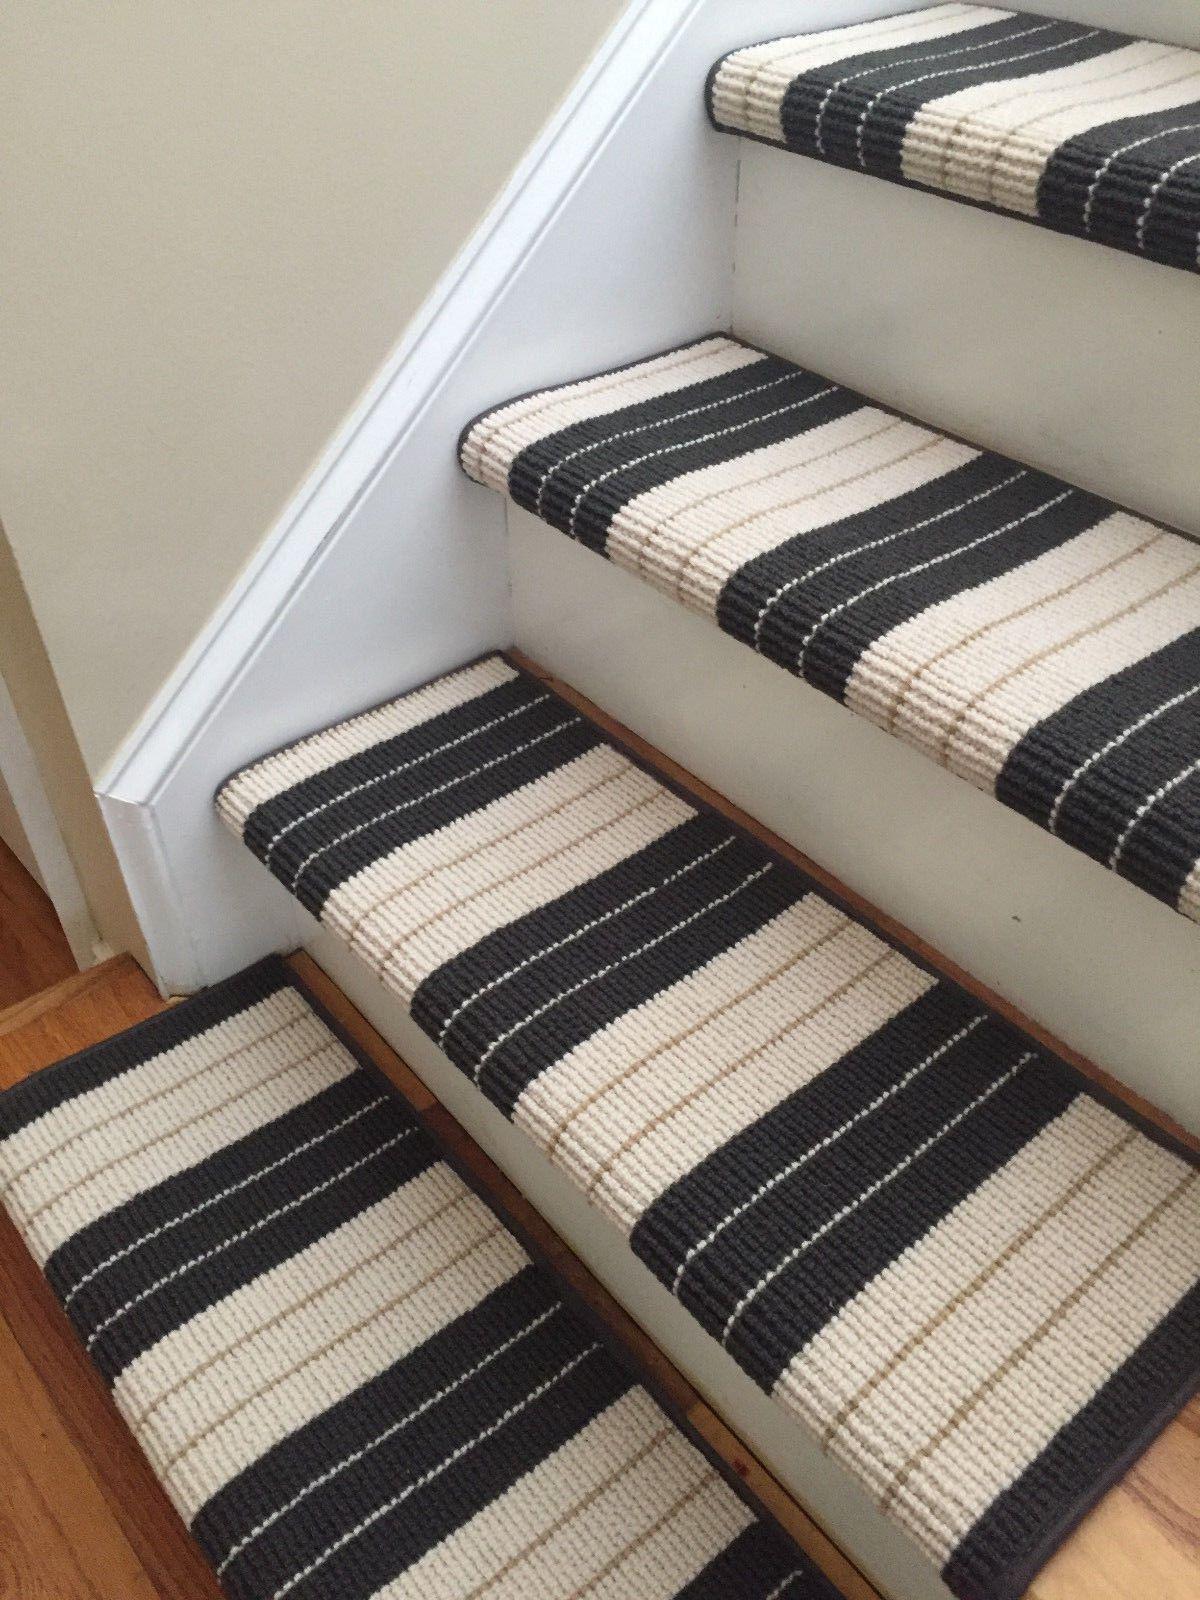 Best Customer Reviews Carpet Stair Treads Runner Replacement 400 x 300